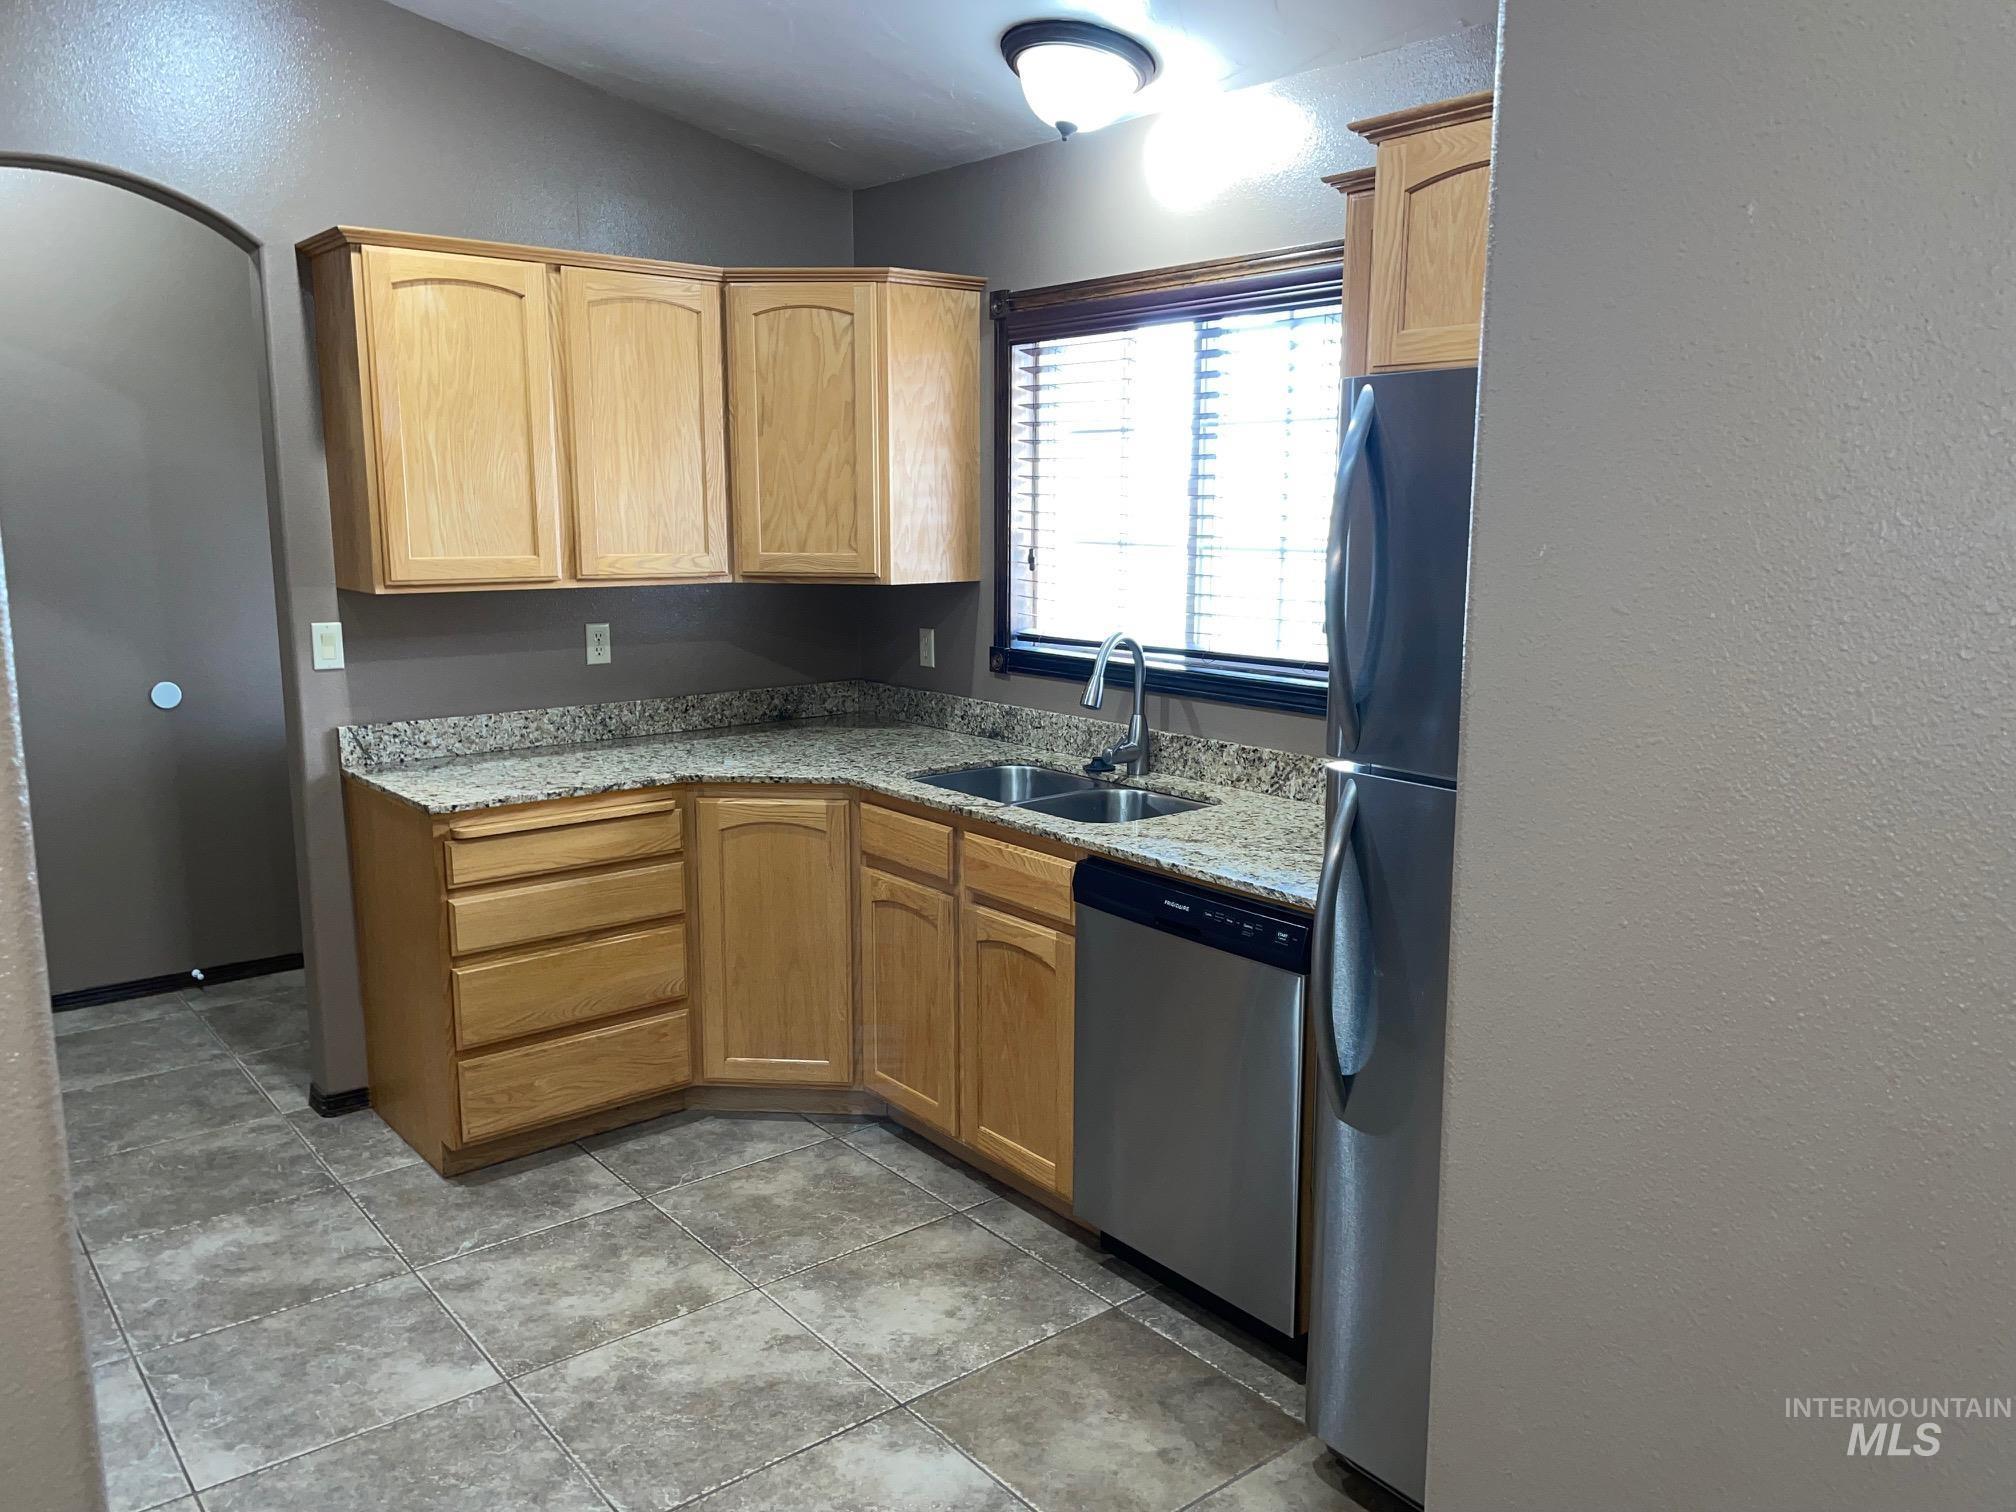 423 N 100 E Property Photo 36